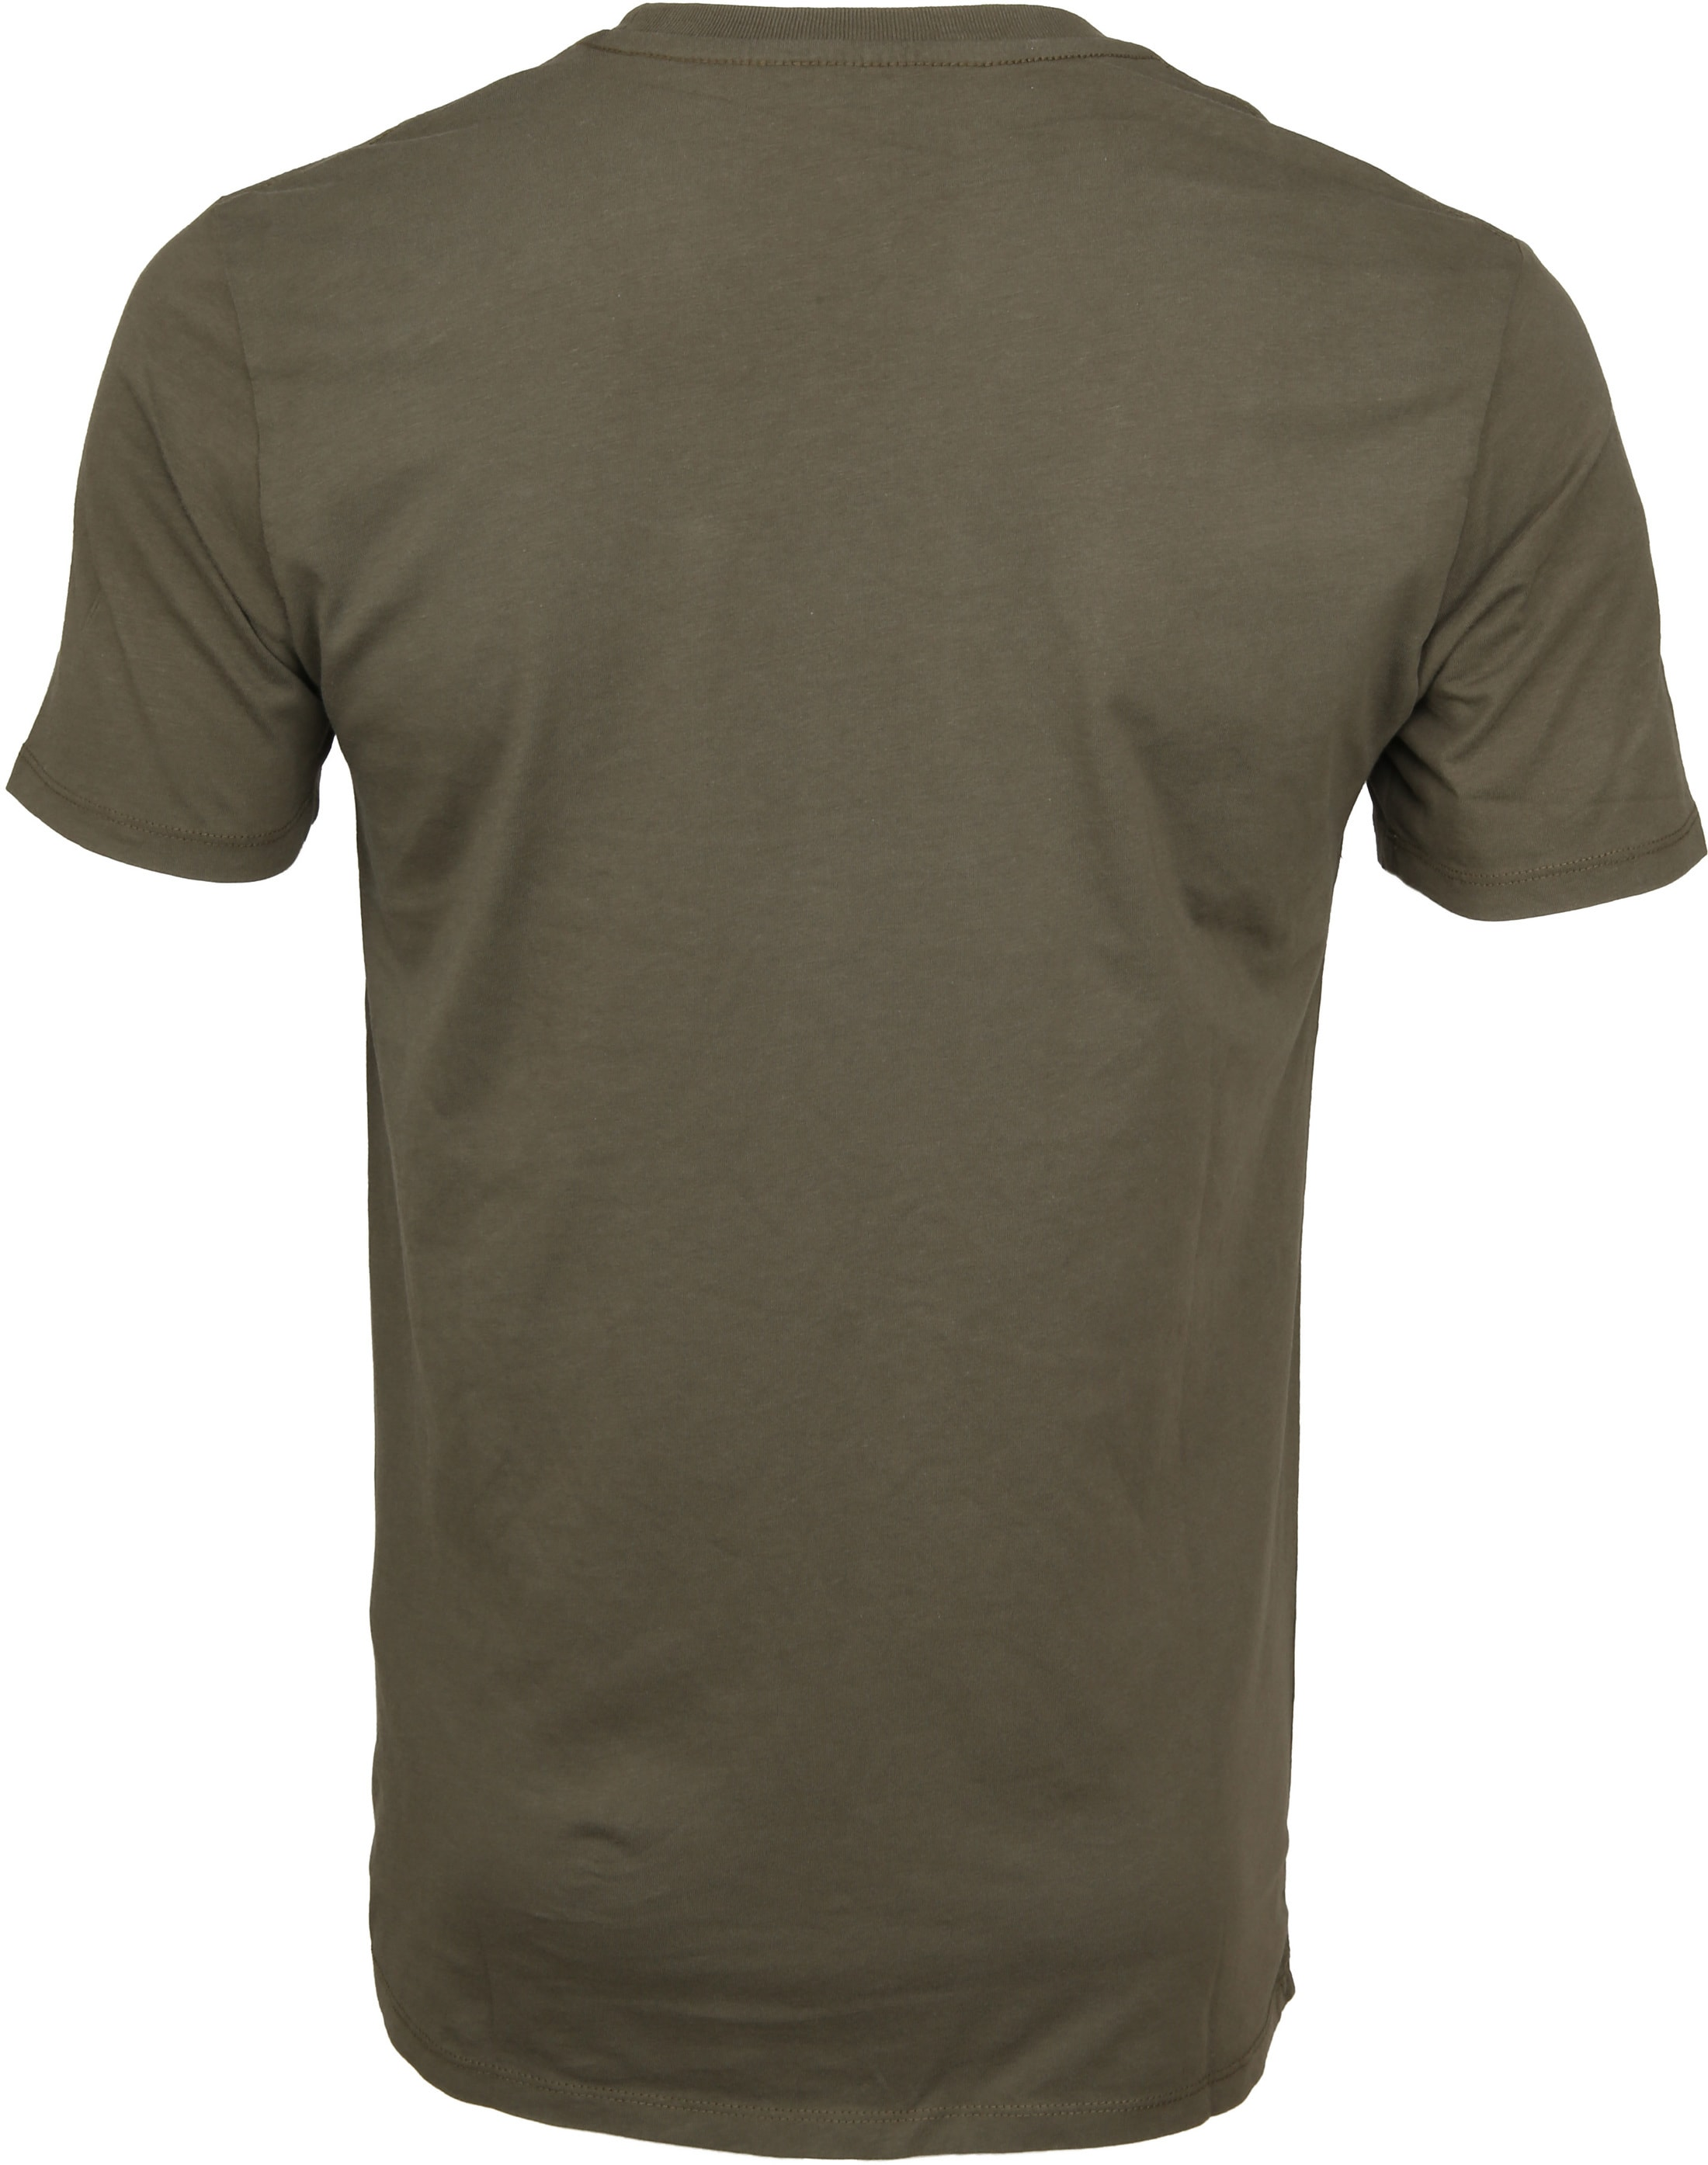 Levi's T-shirt Groen Logo foto 2